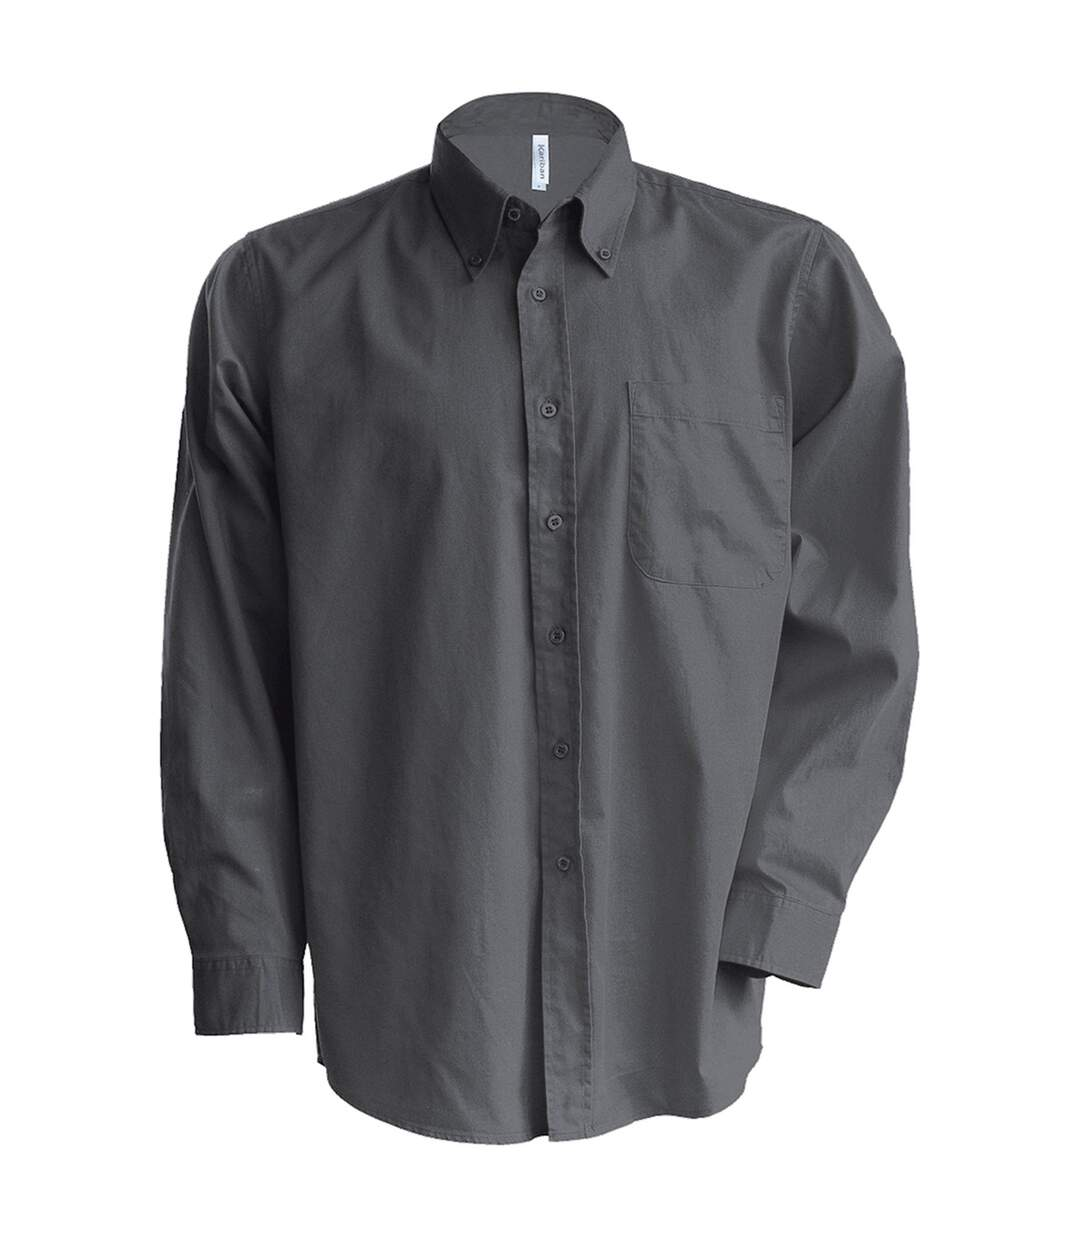 Kariban Mens Long Sleeve Easy Care Oxford Shirt (Oxford Blue) - UTRW719